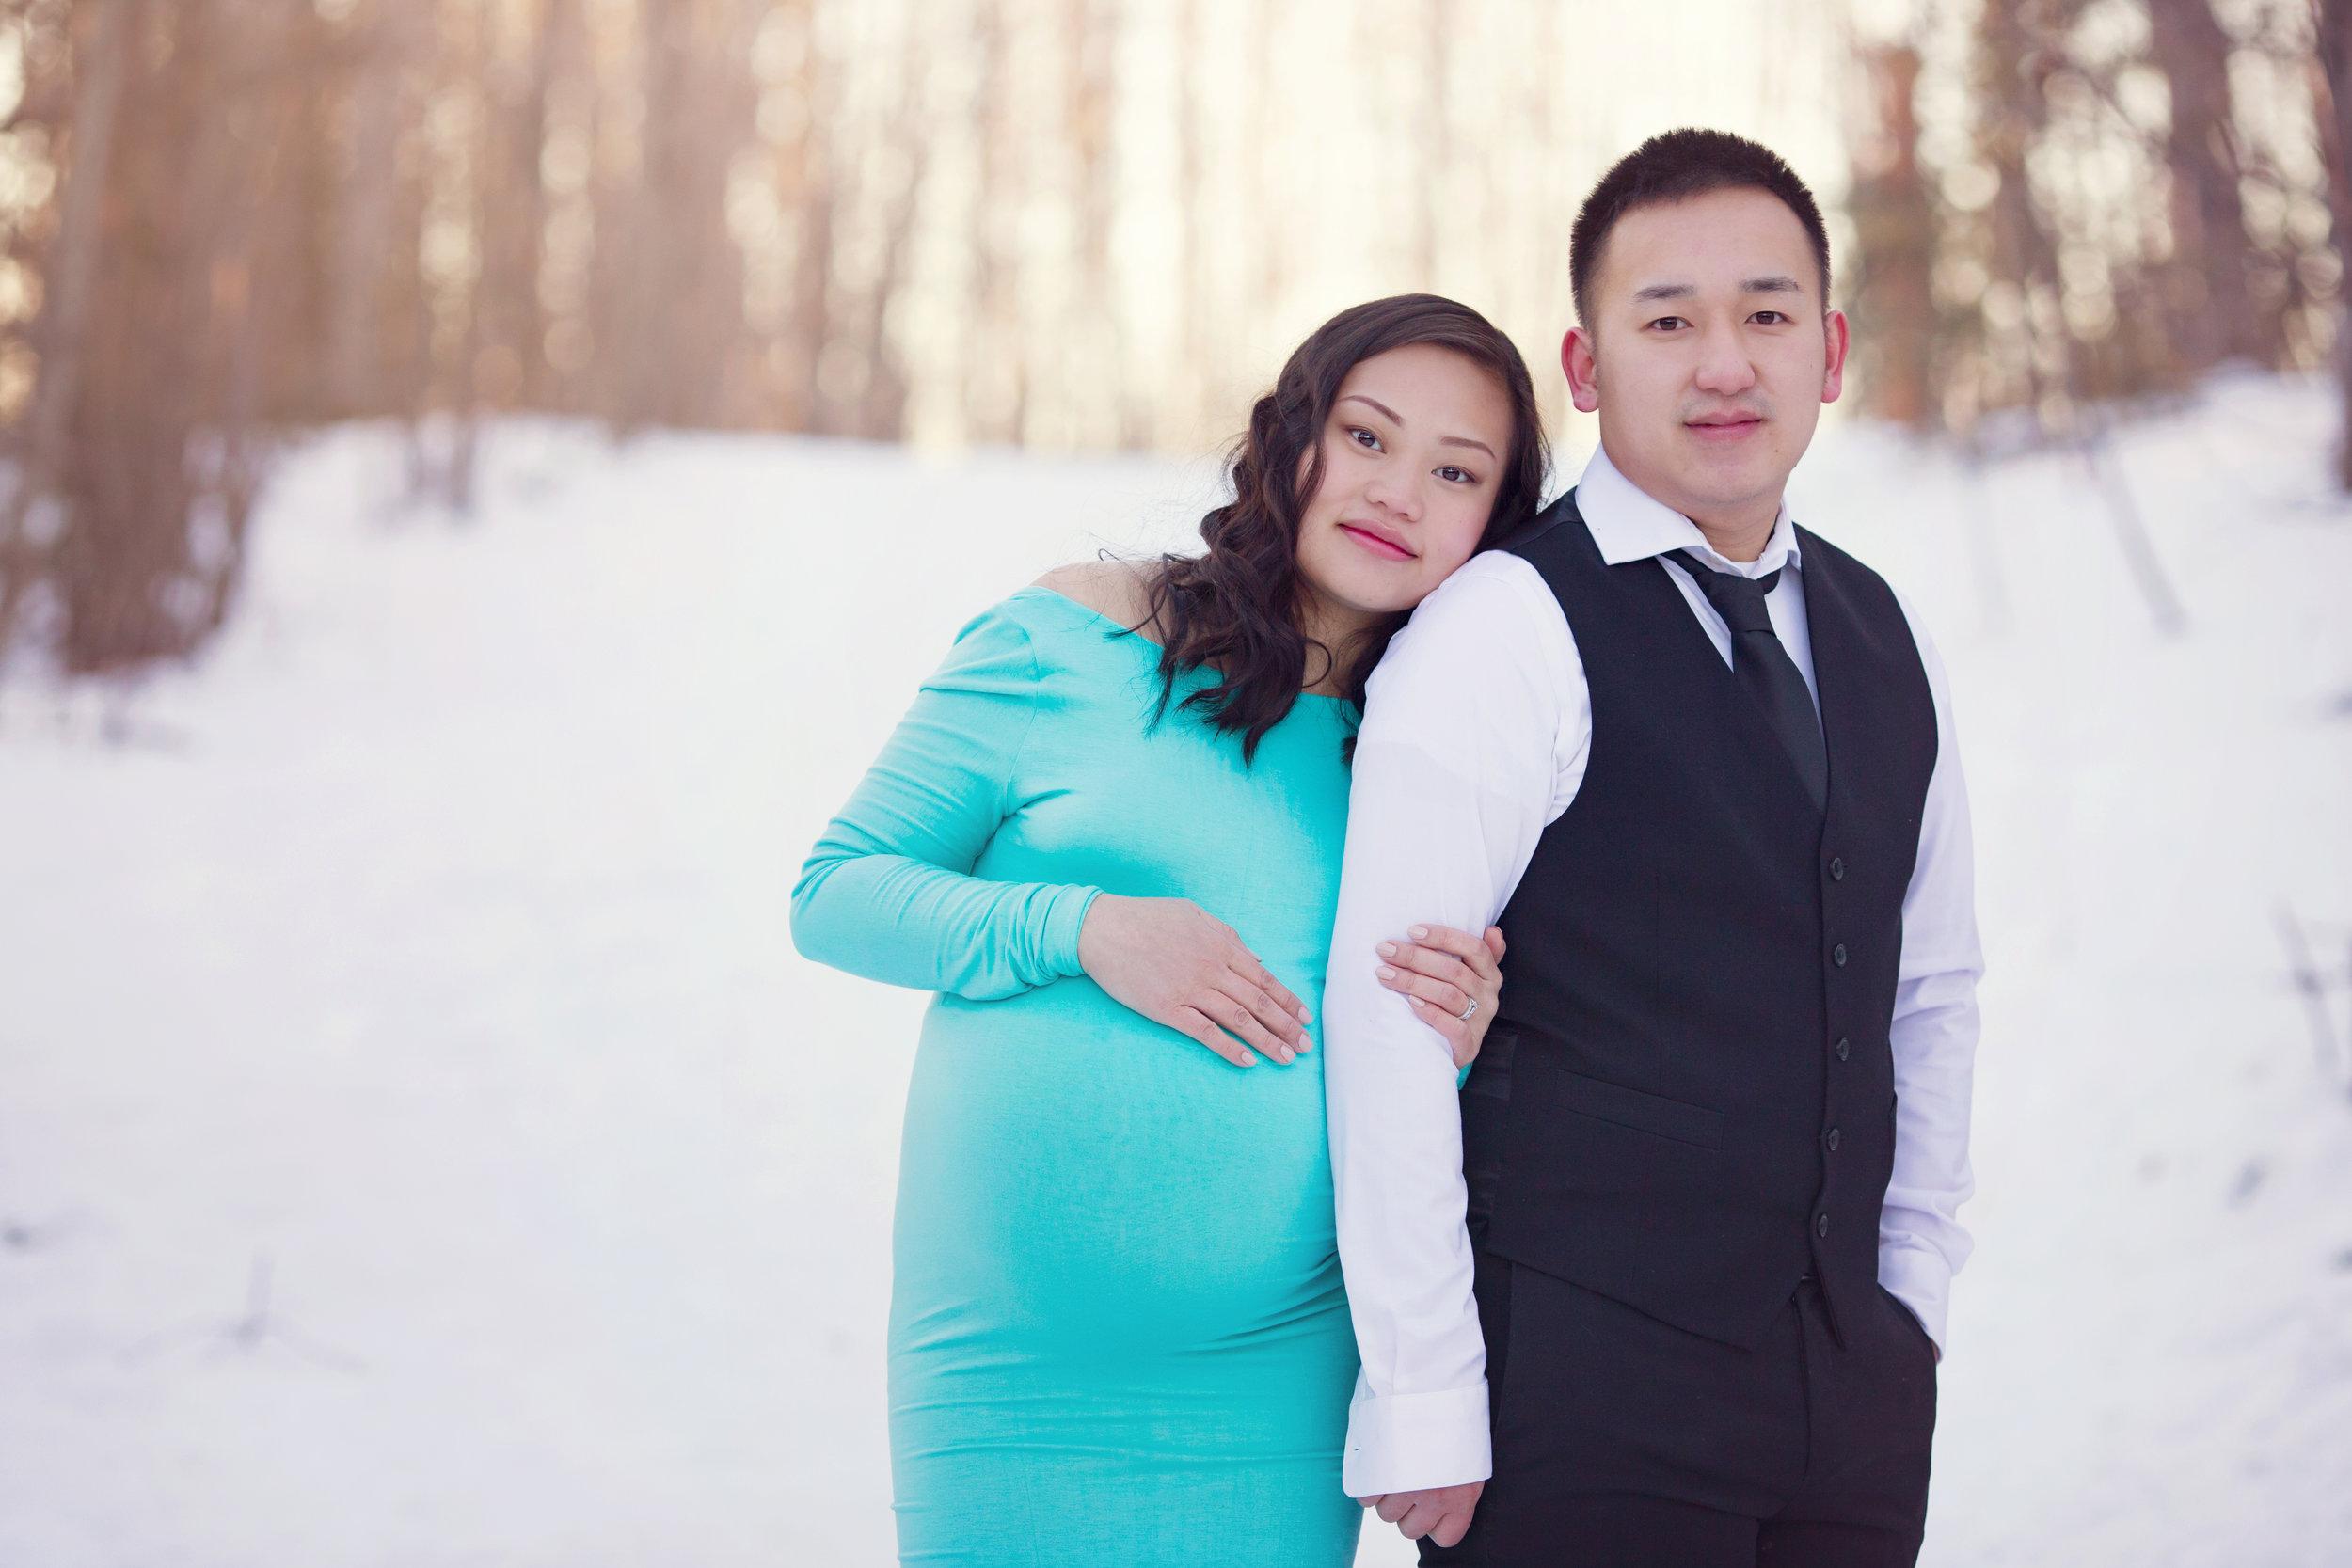 anchorage-maternity-photographer-7.jpg